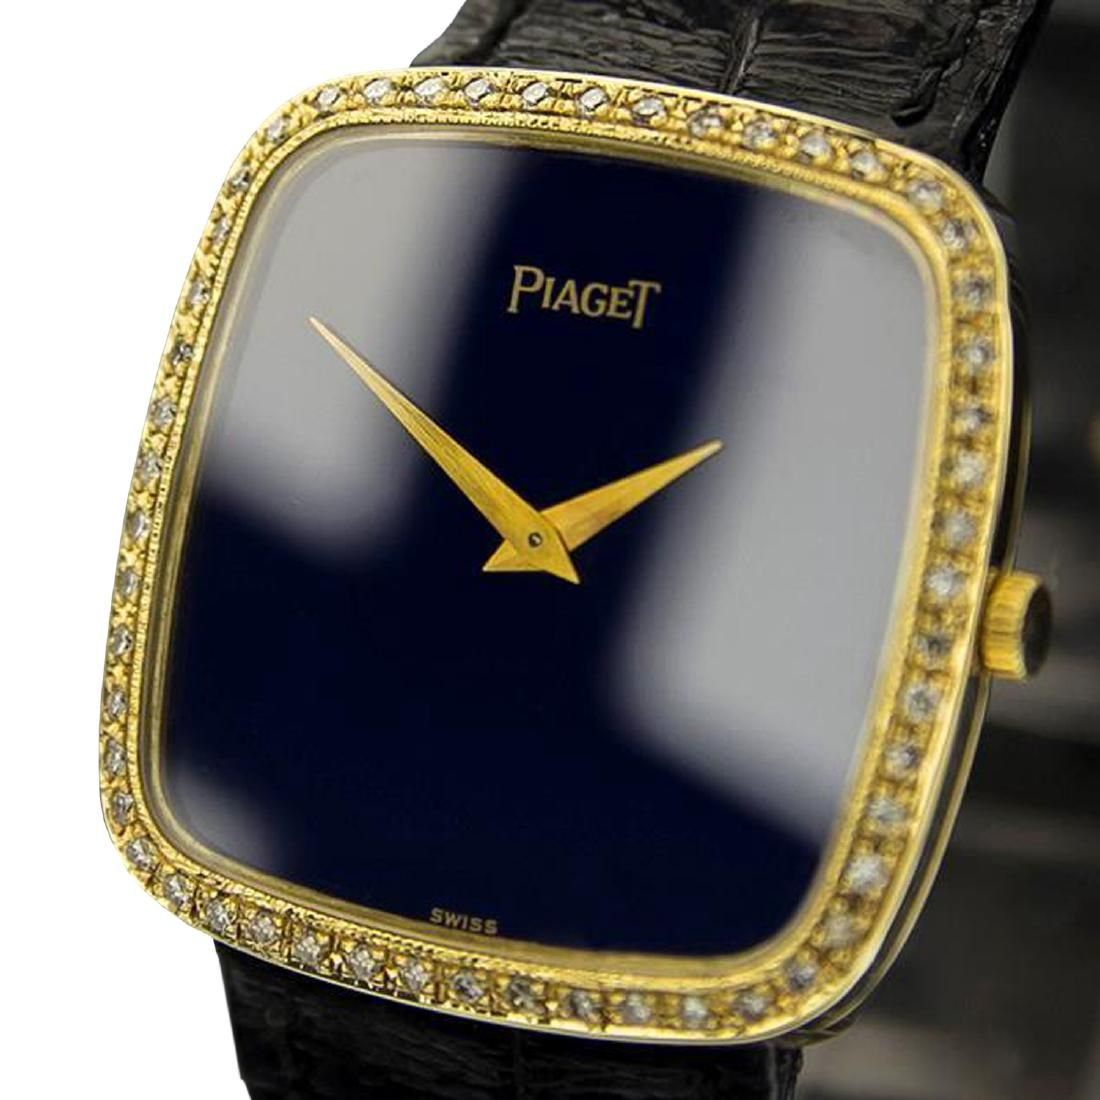 *Piaget 9772 Mens Diamond 18k Solid Gold Manual Wind